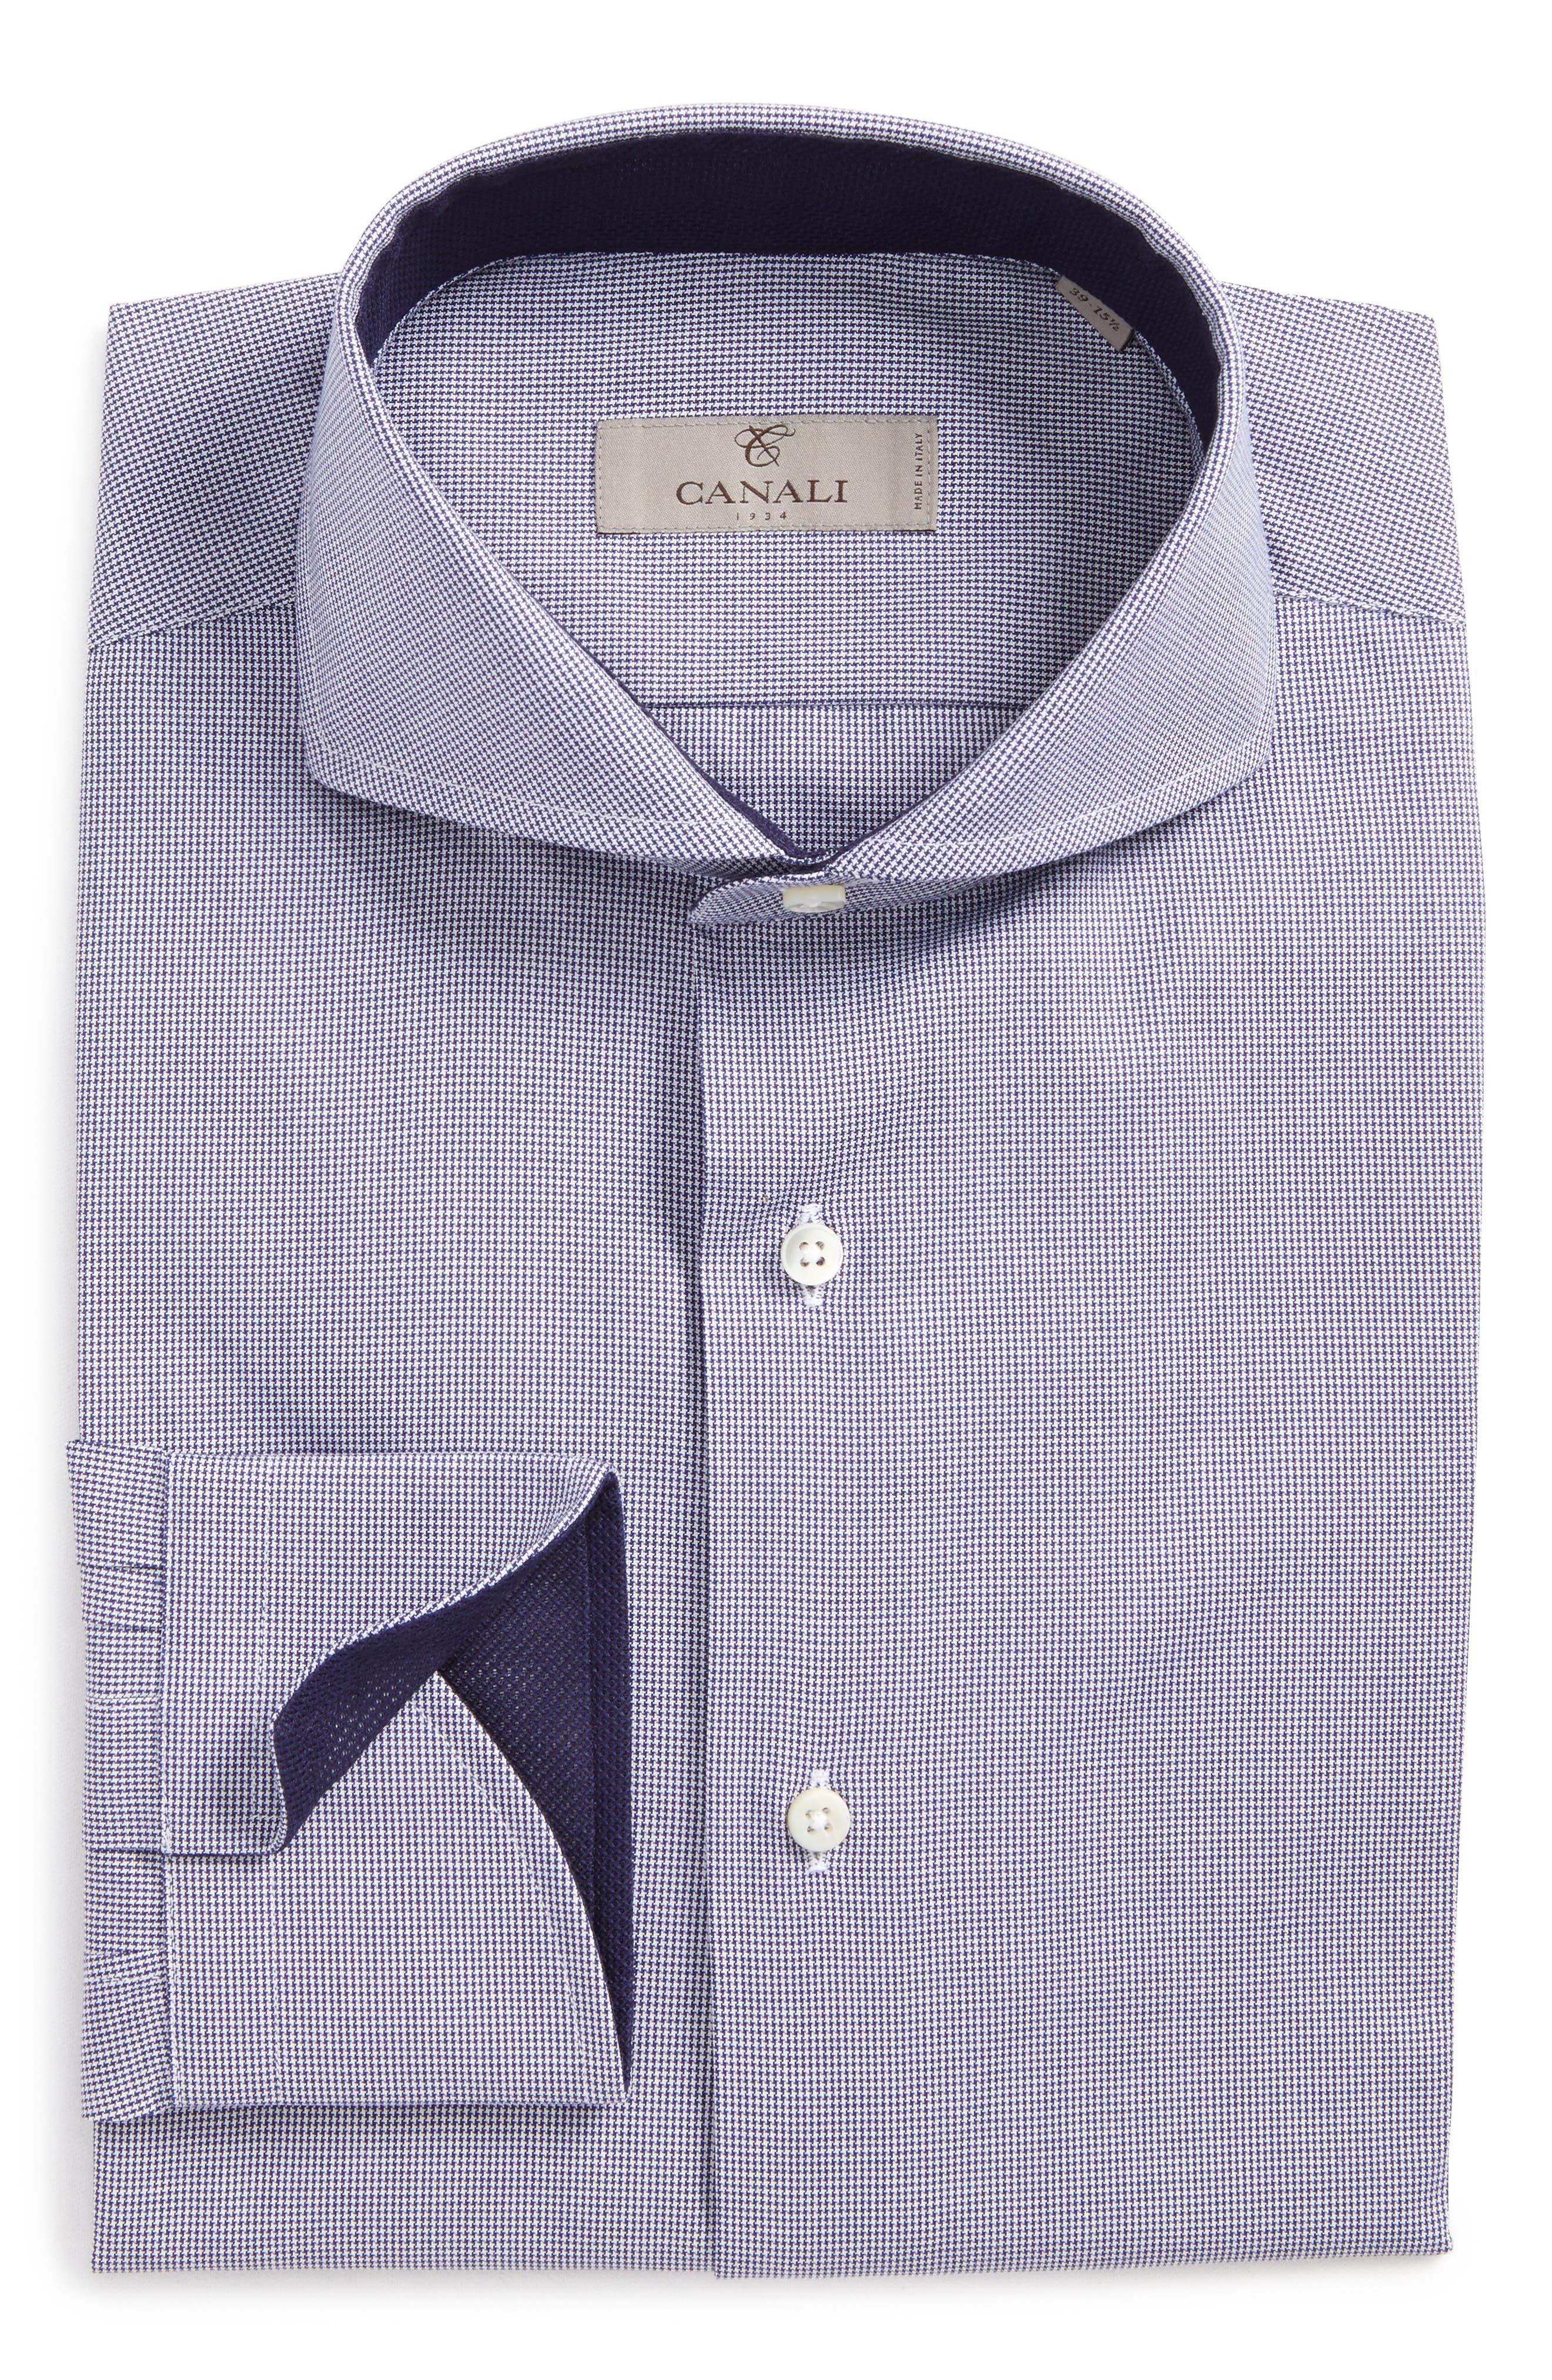 Regular Fit Houndstooth Dress Shirt,                             Main thumbnail 1, color,